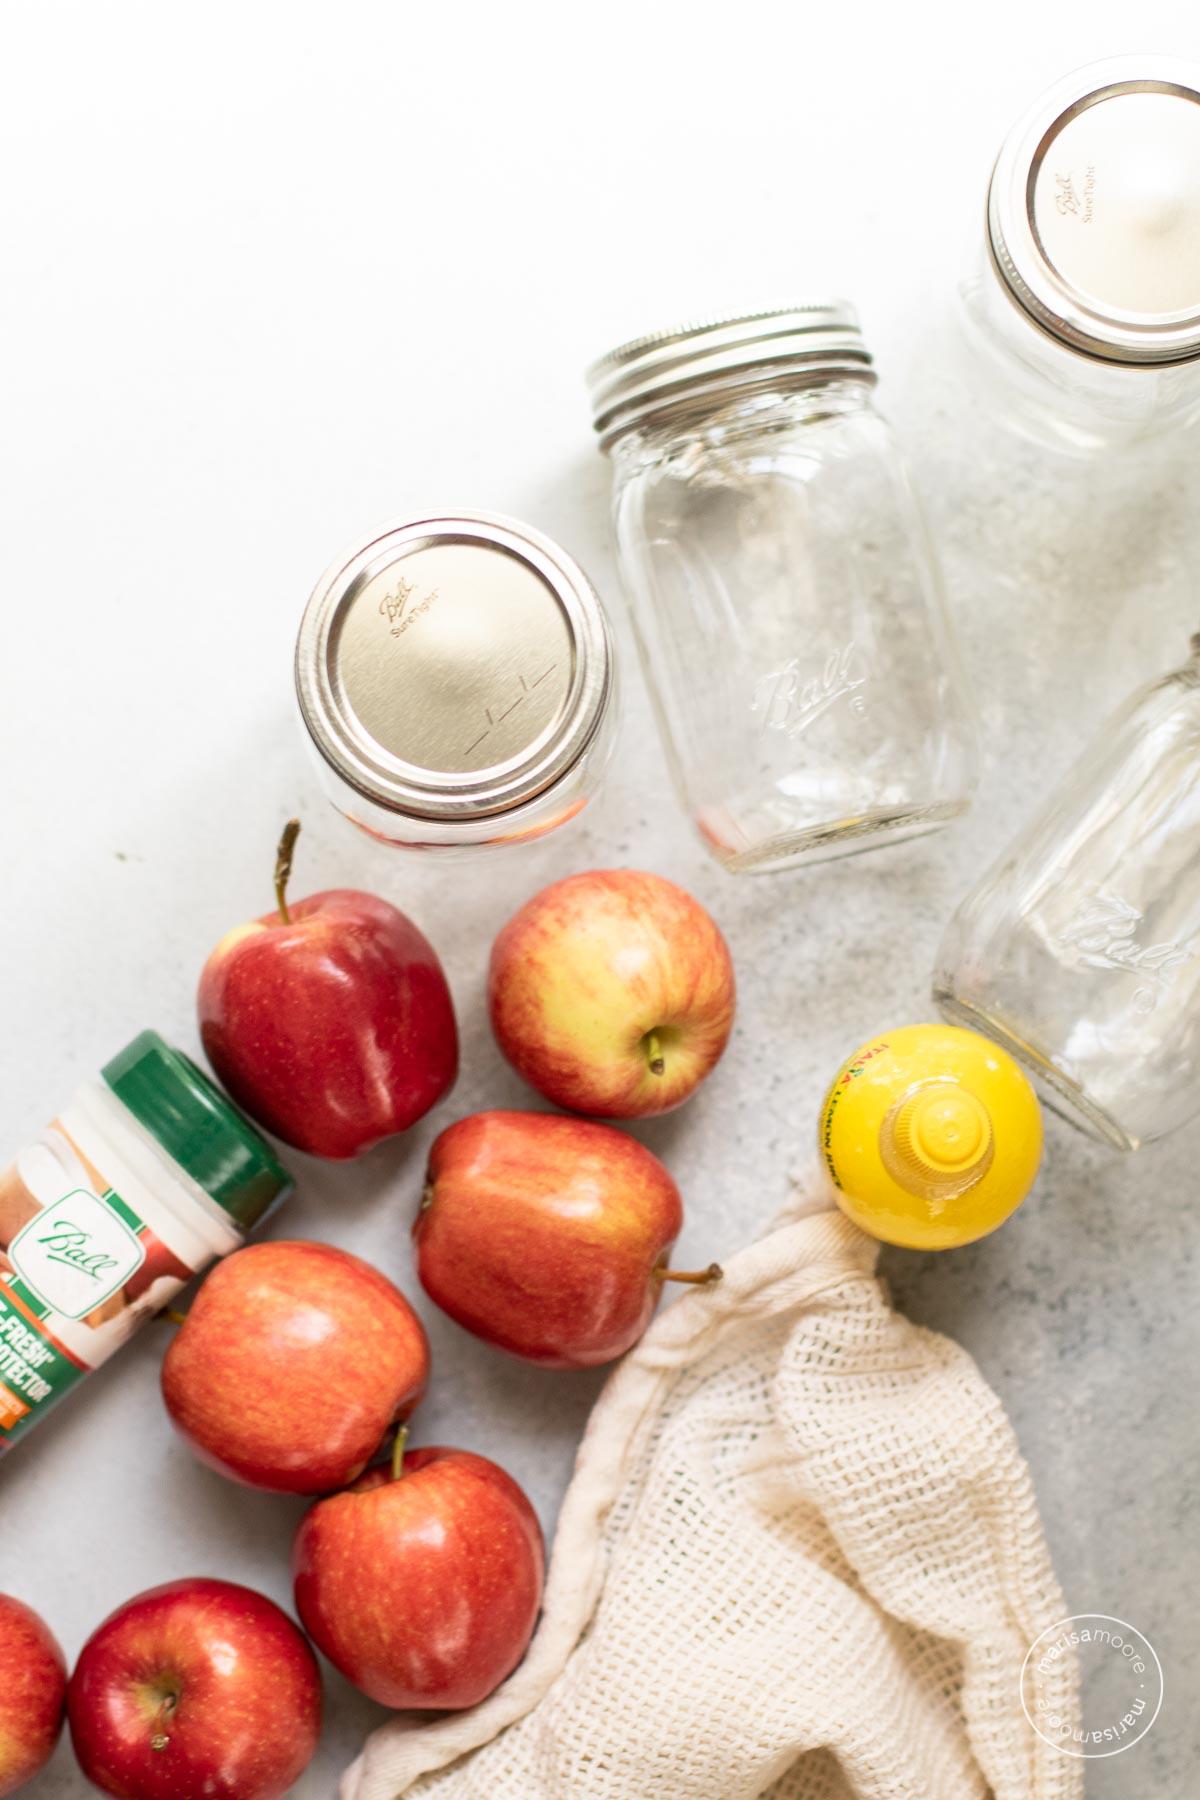 Ingredients for the recipe: apples, bottled lemon juice, fruit protector, empty pint jars